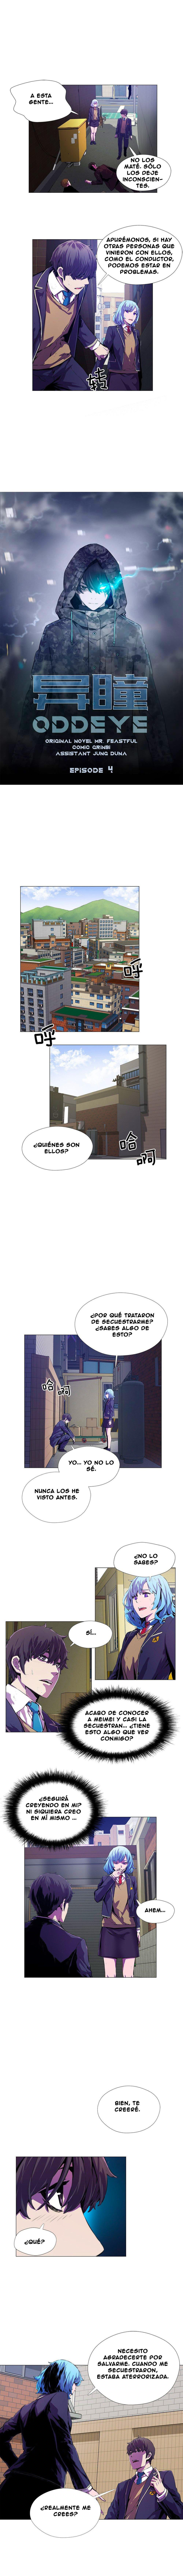 https://nine.mangadogs.com/es_manga/pic9/37/37221/970432/980d001672d75dff701edc14ab031216.jpg Page 1